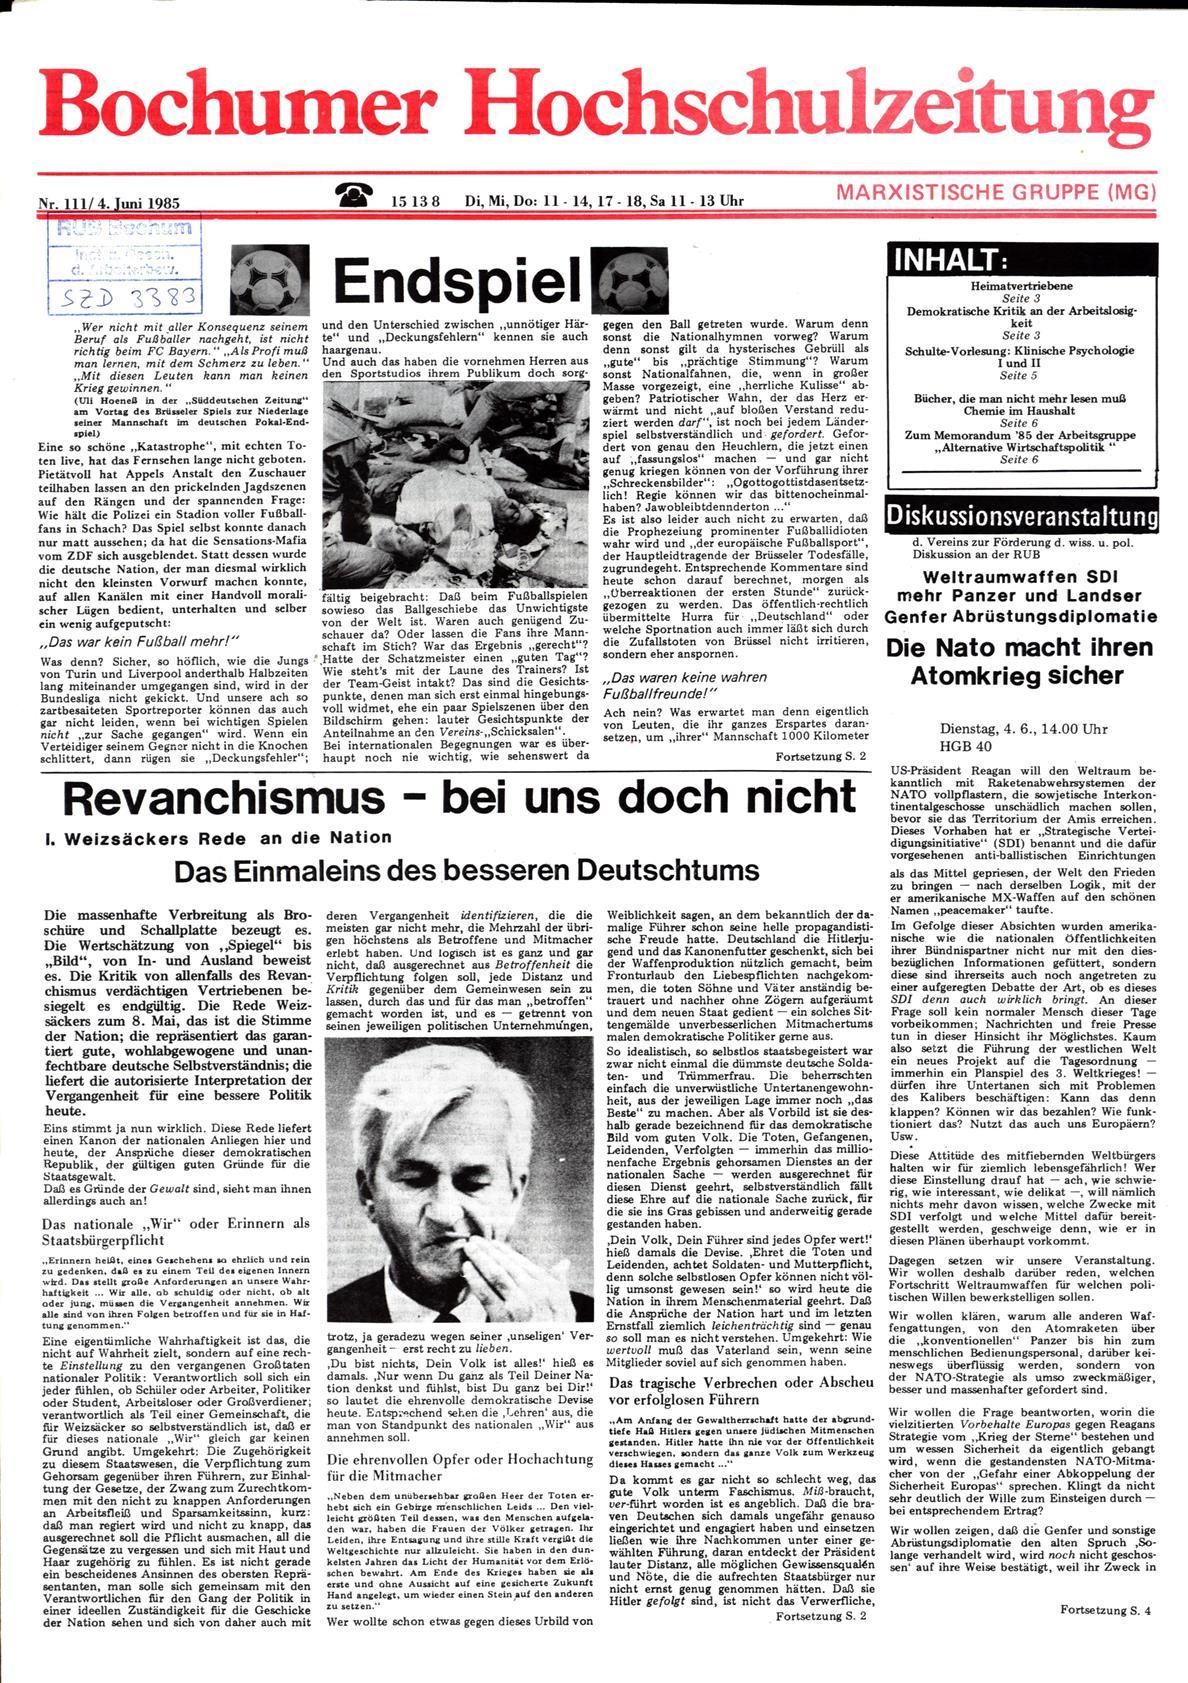 Bochum_BHZ_19850604_111_001